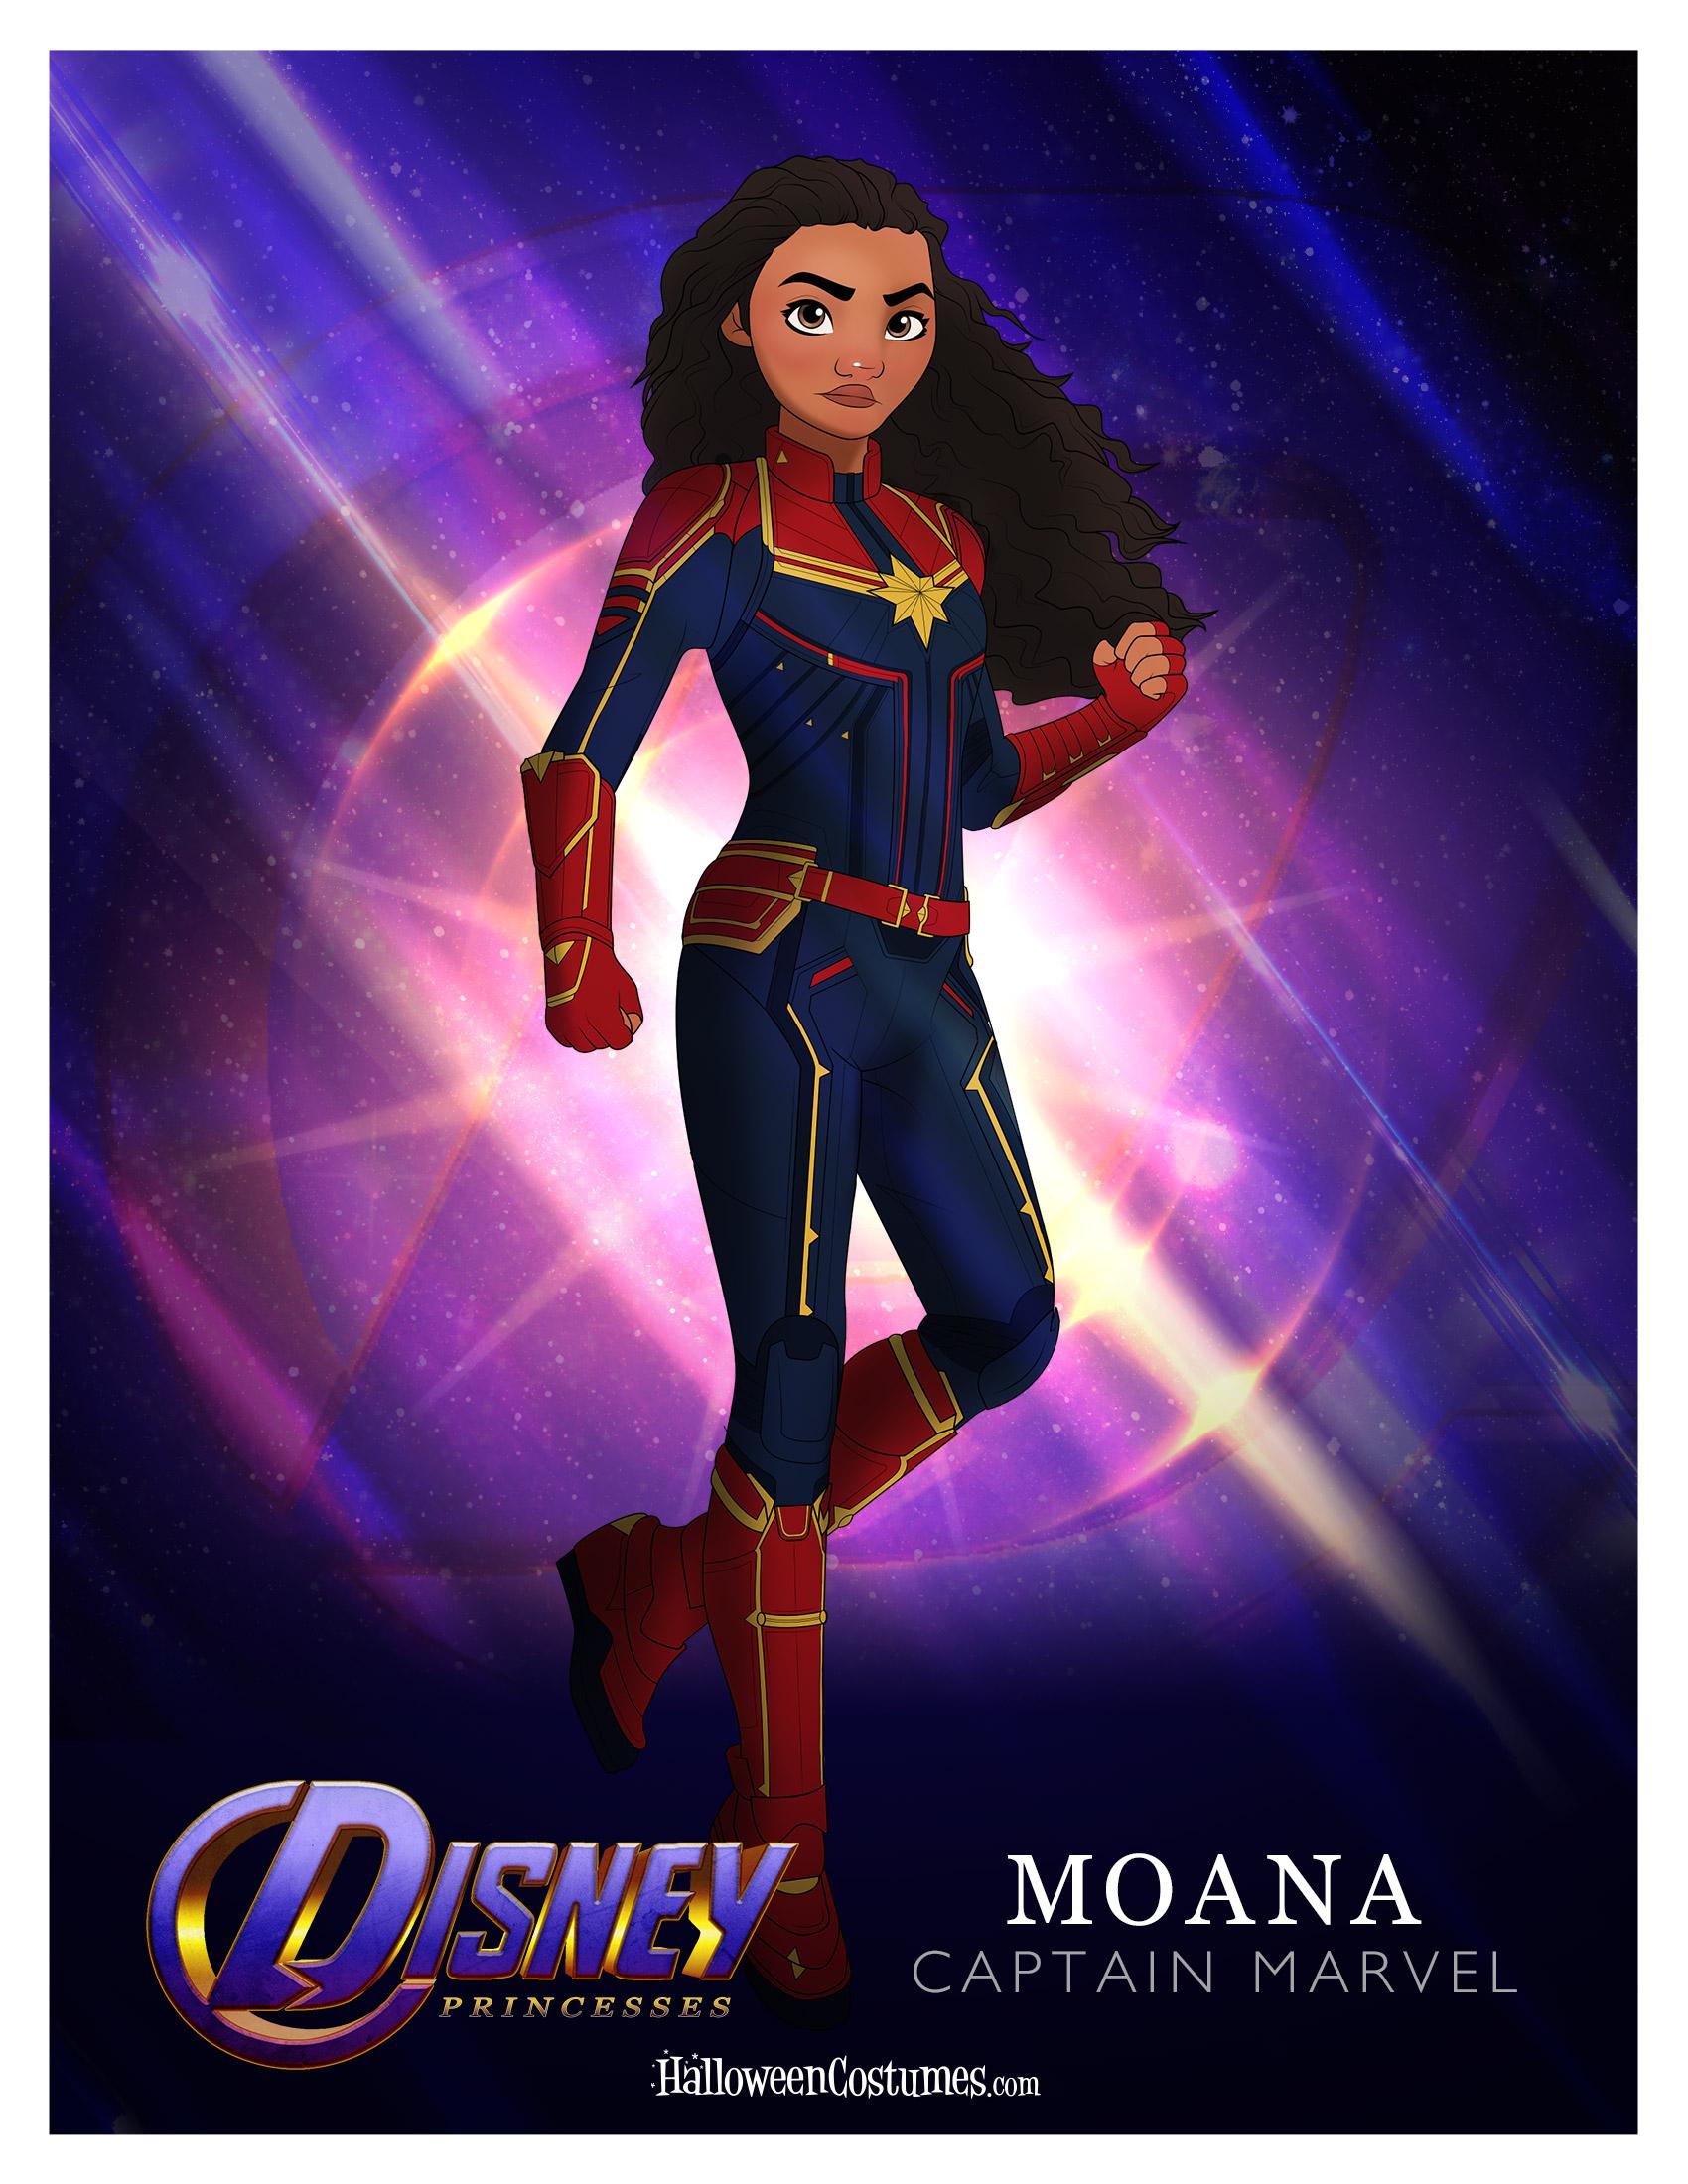 Princess Moana as Captain Marvel